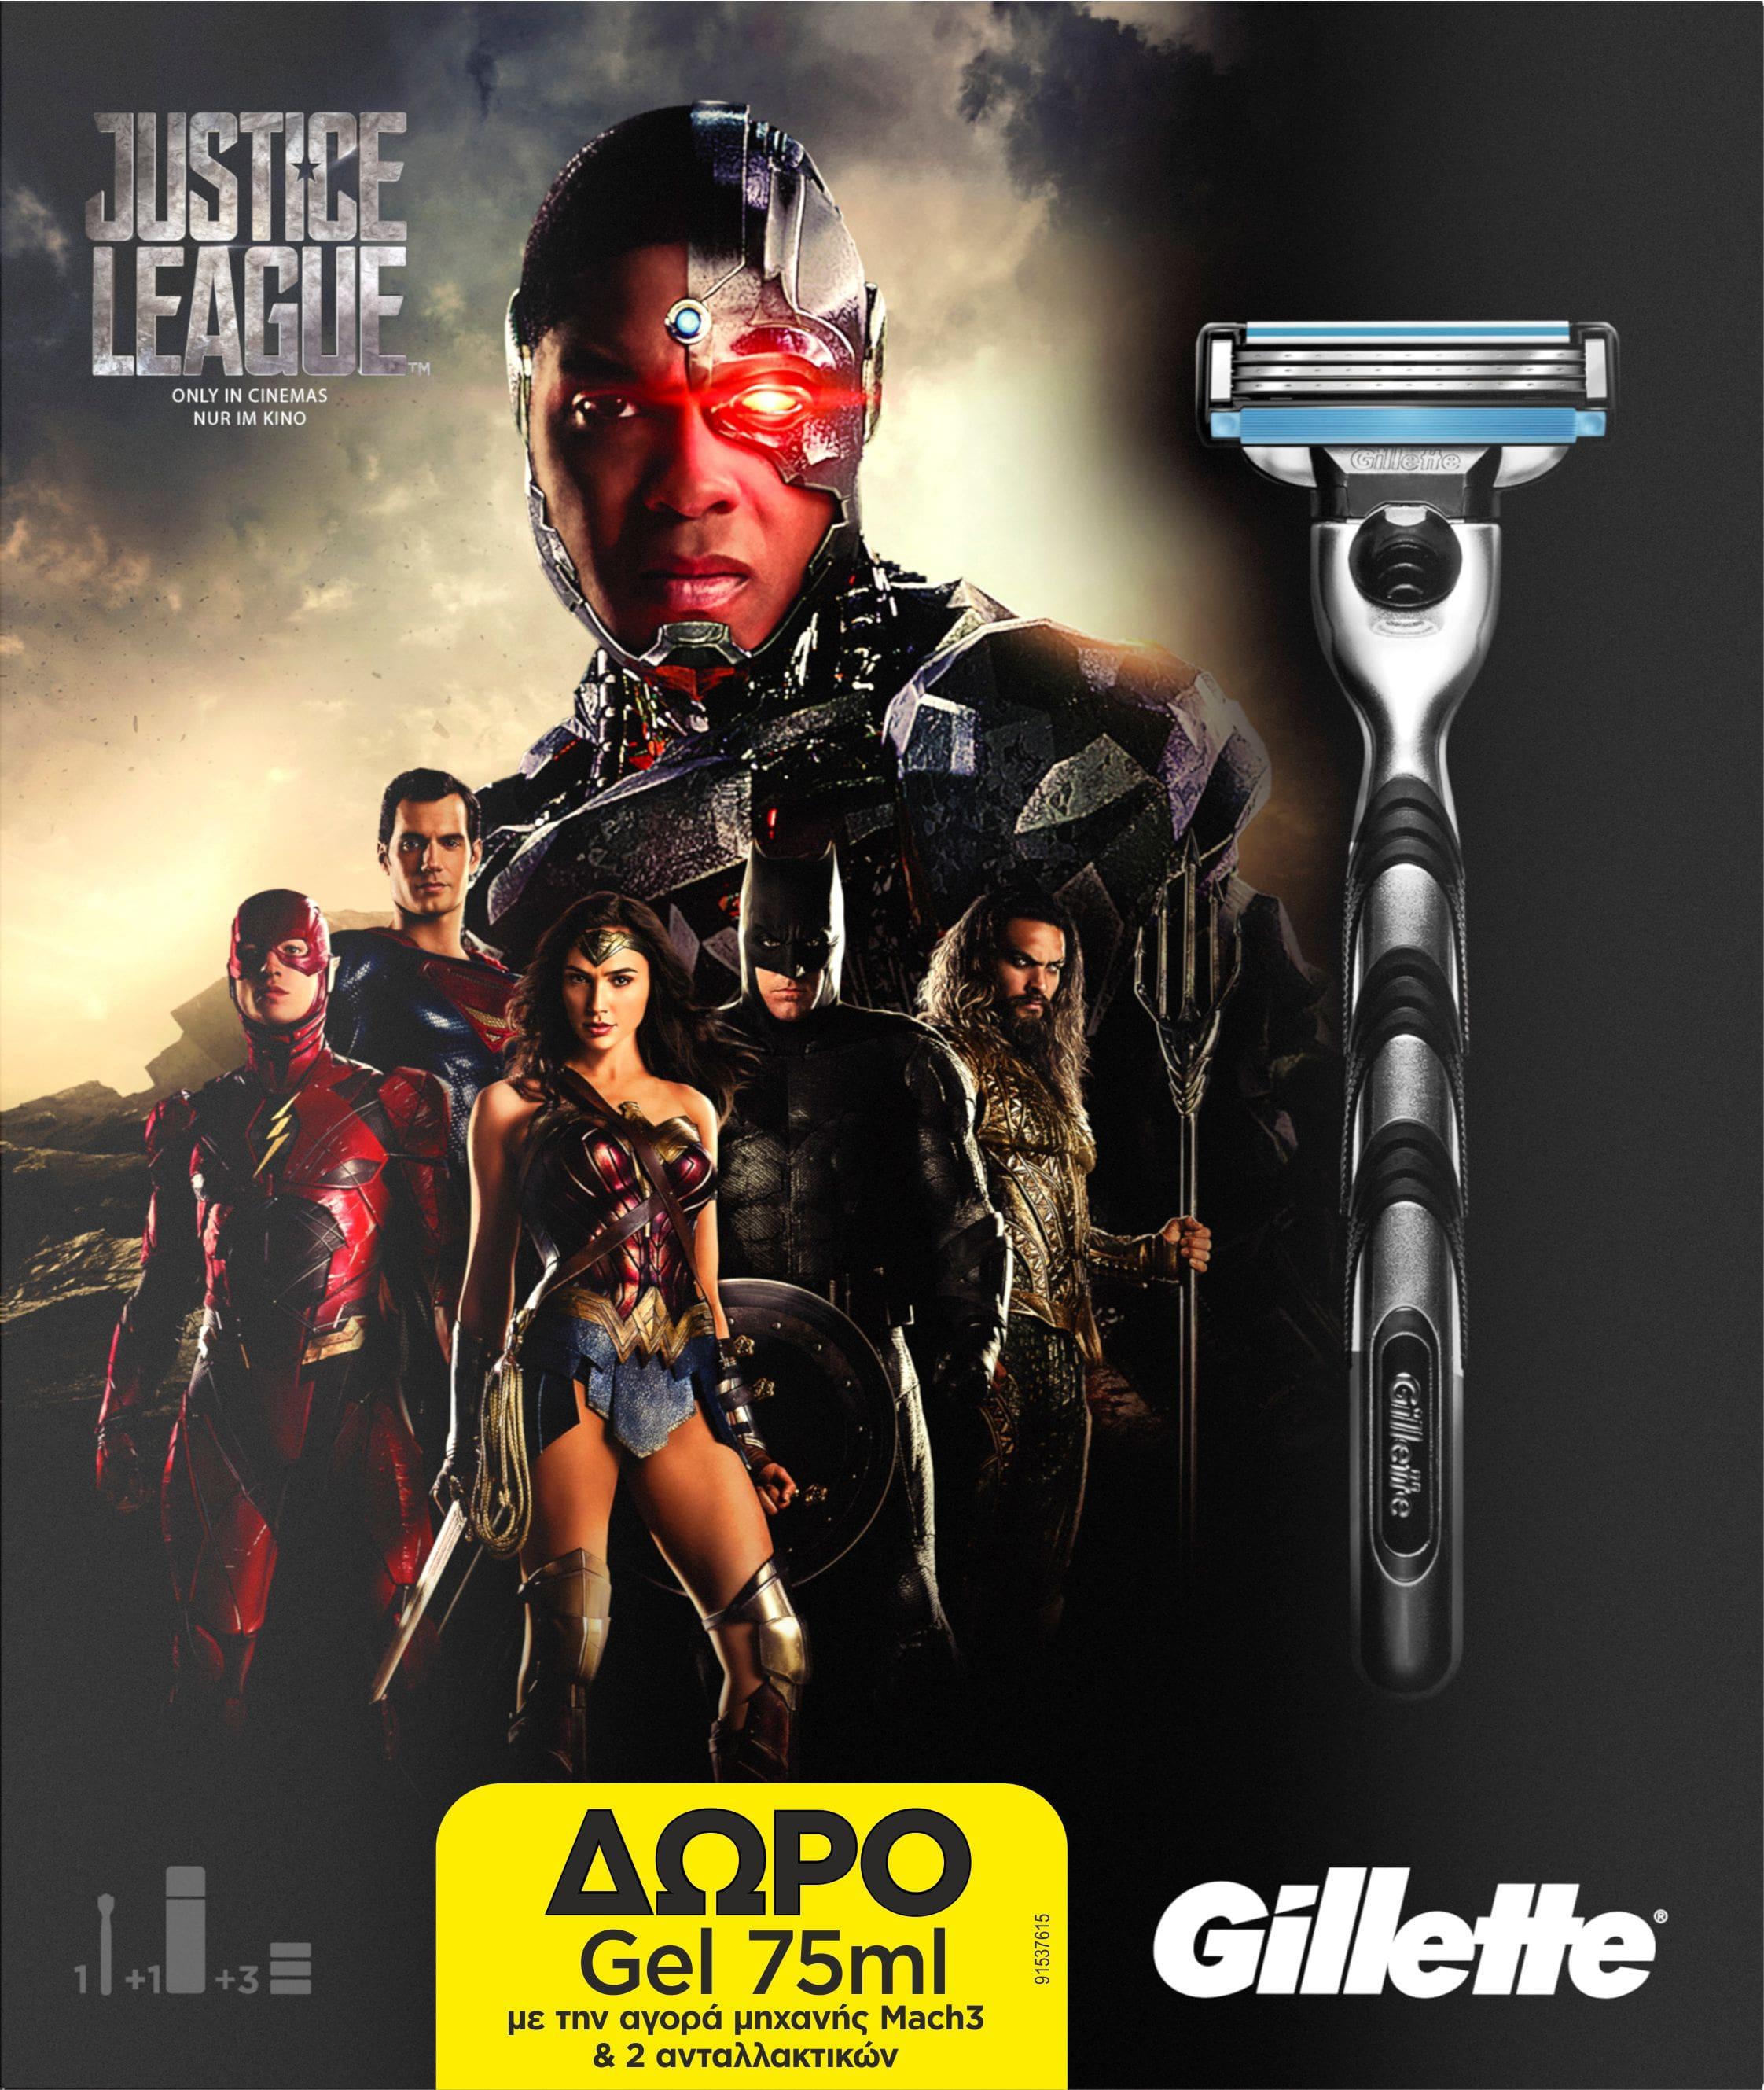 Gillette Justice League Limited Edition Mach3 Σετ Δώρου με Mach 3 Ξυριστική  Μηχανή με 3 λεπτές 7dcfc5a4751